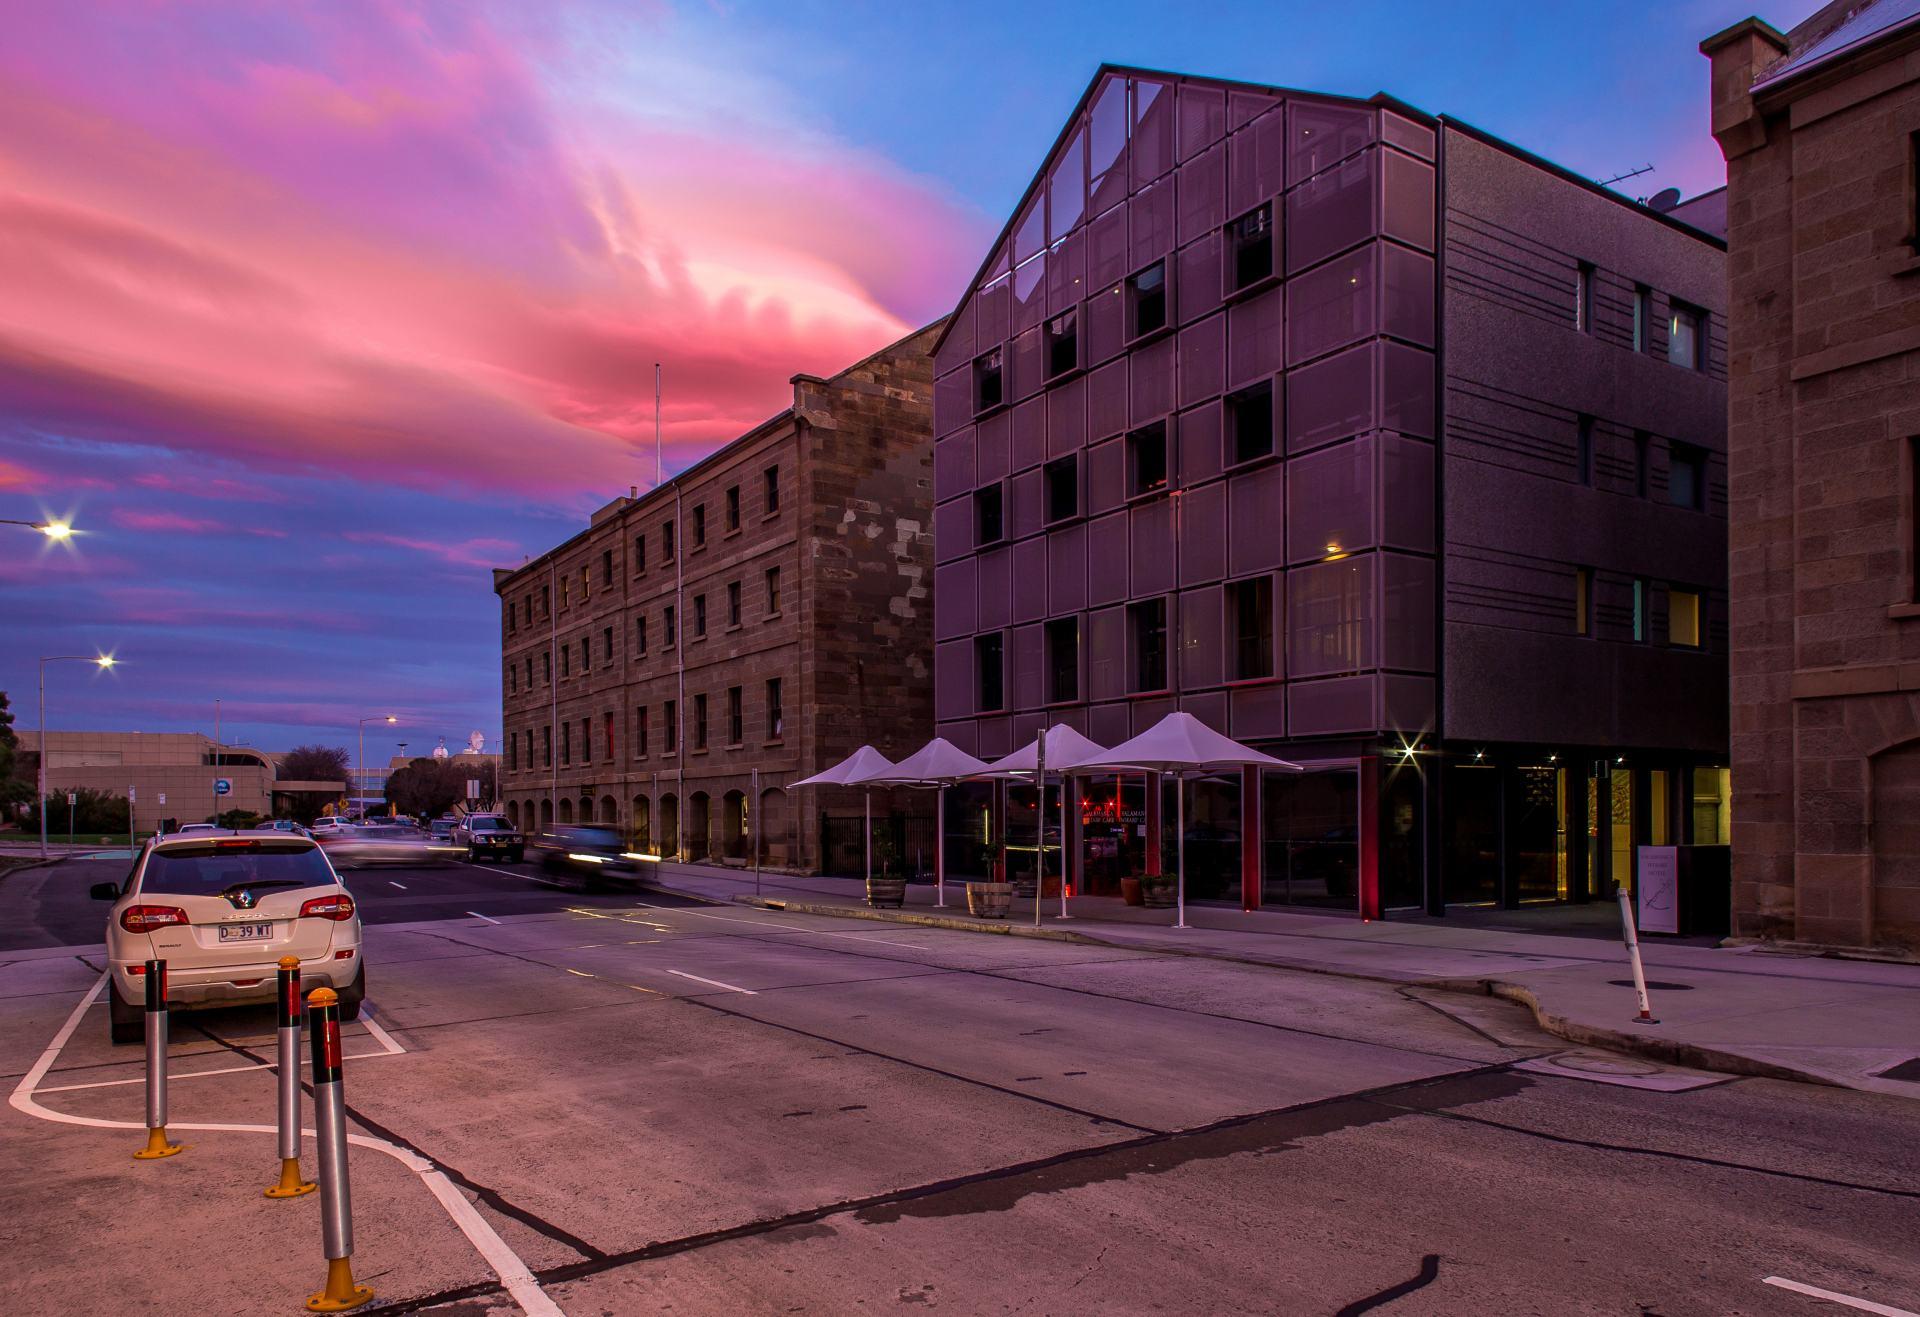 salamanca wharf hotel at sunset